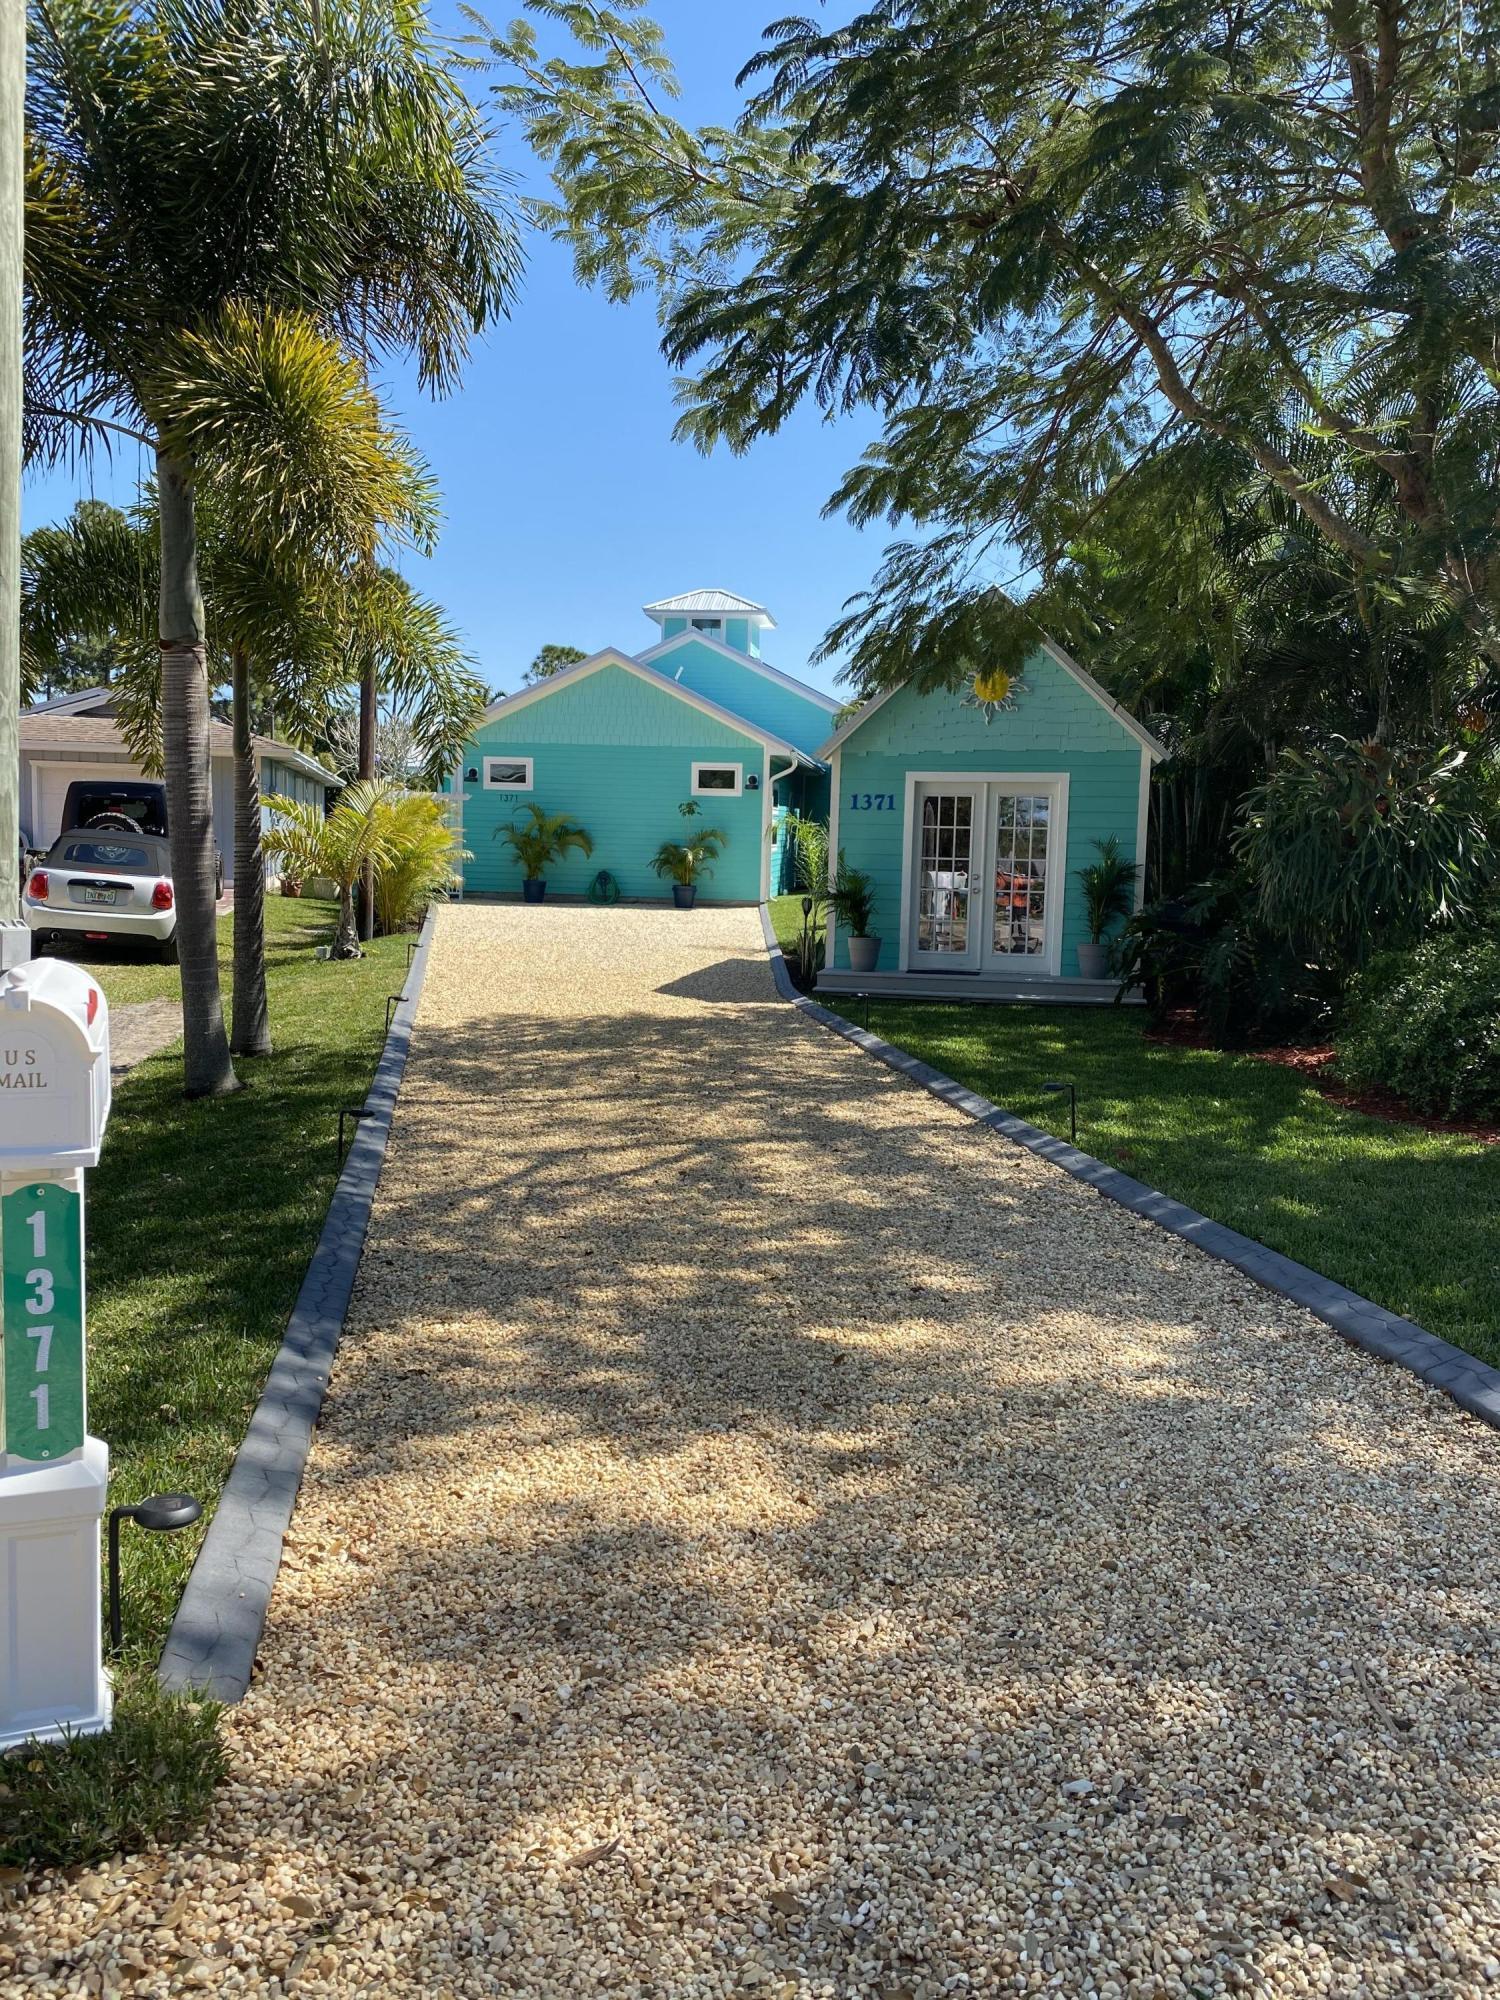 Photo of 1371 SW Evergreen Lane, Palm City, FL 34990